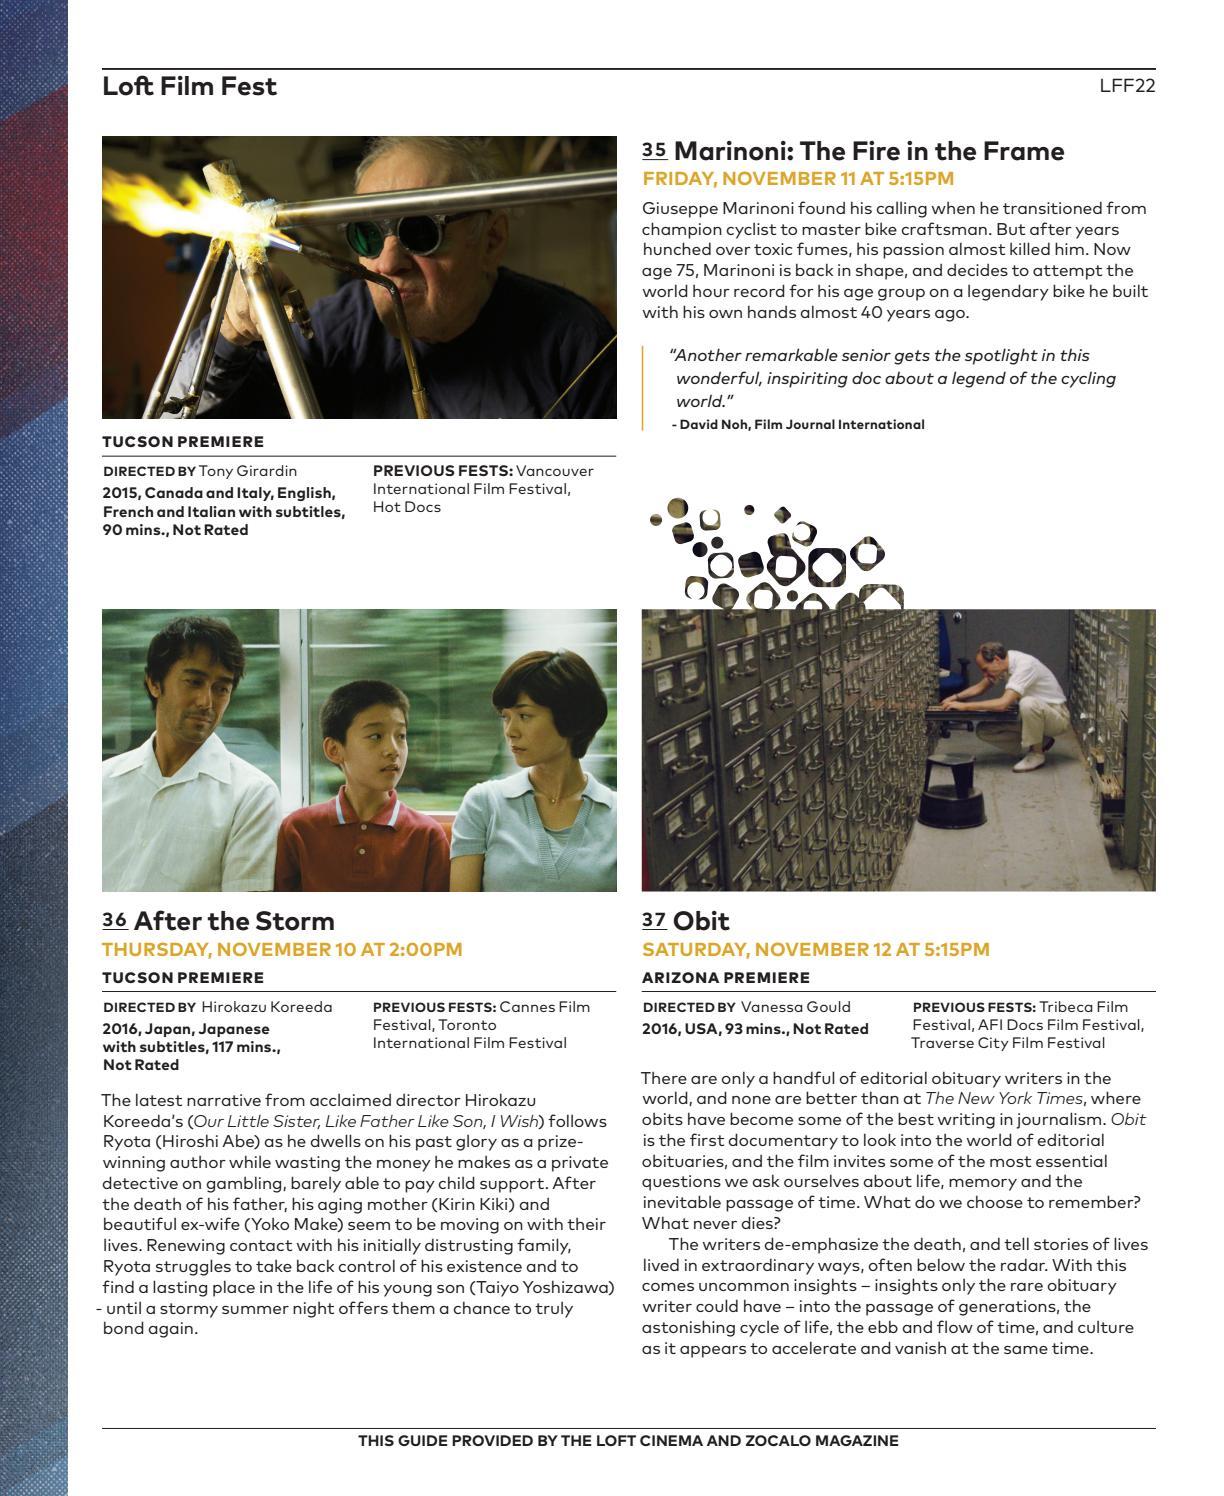 Zocalo Magazine - November 2016 by Zocalo Magazine - issuu